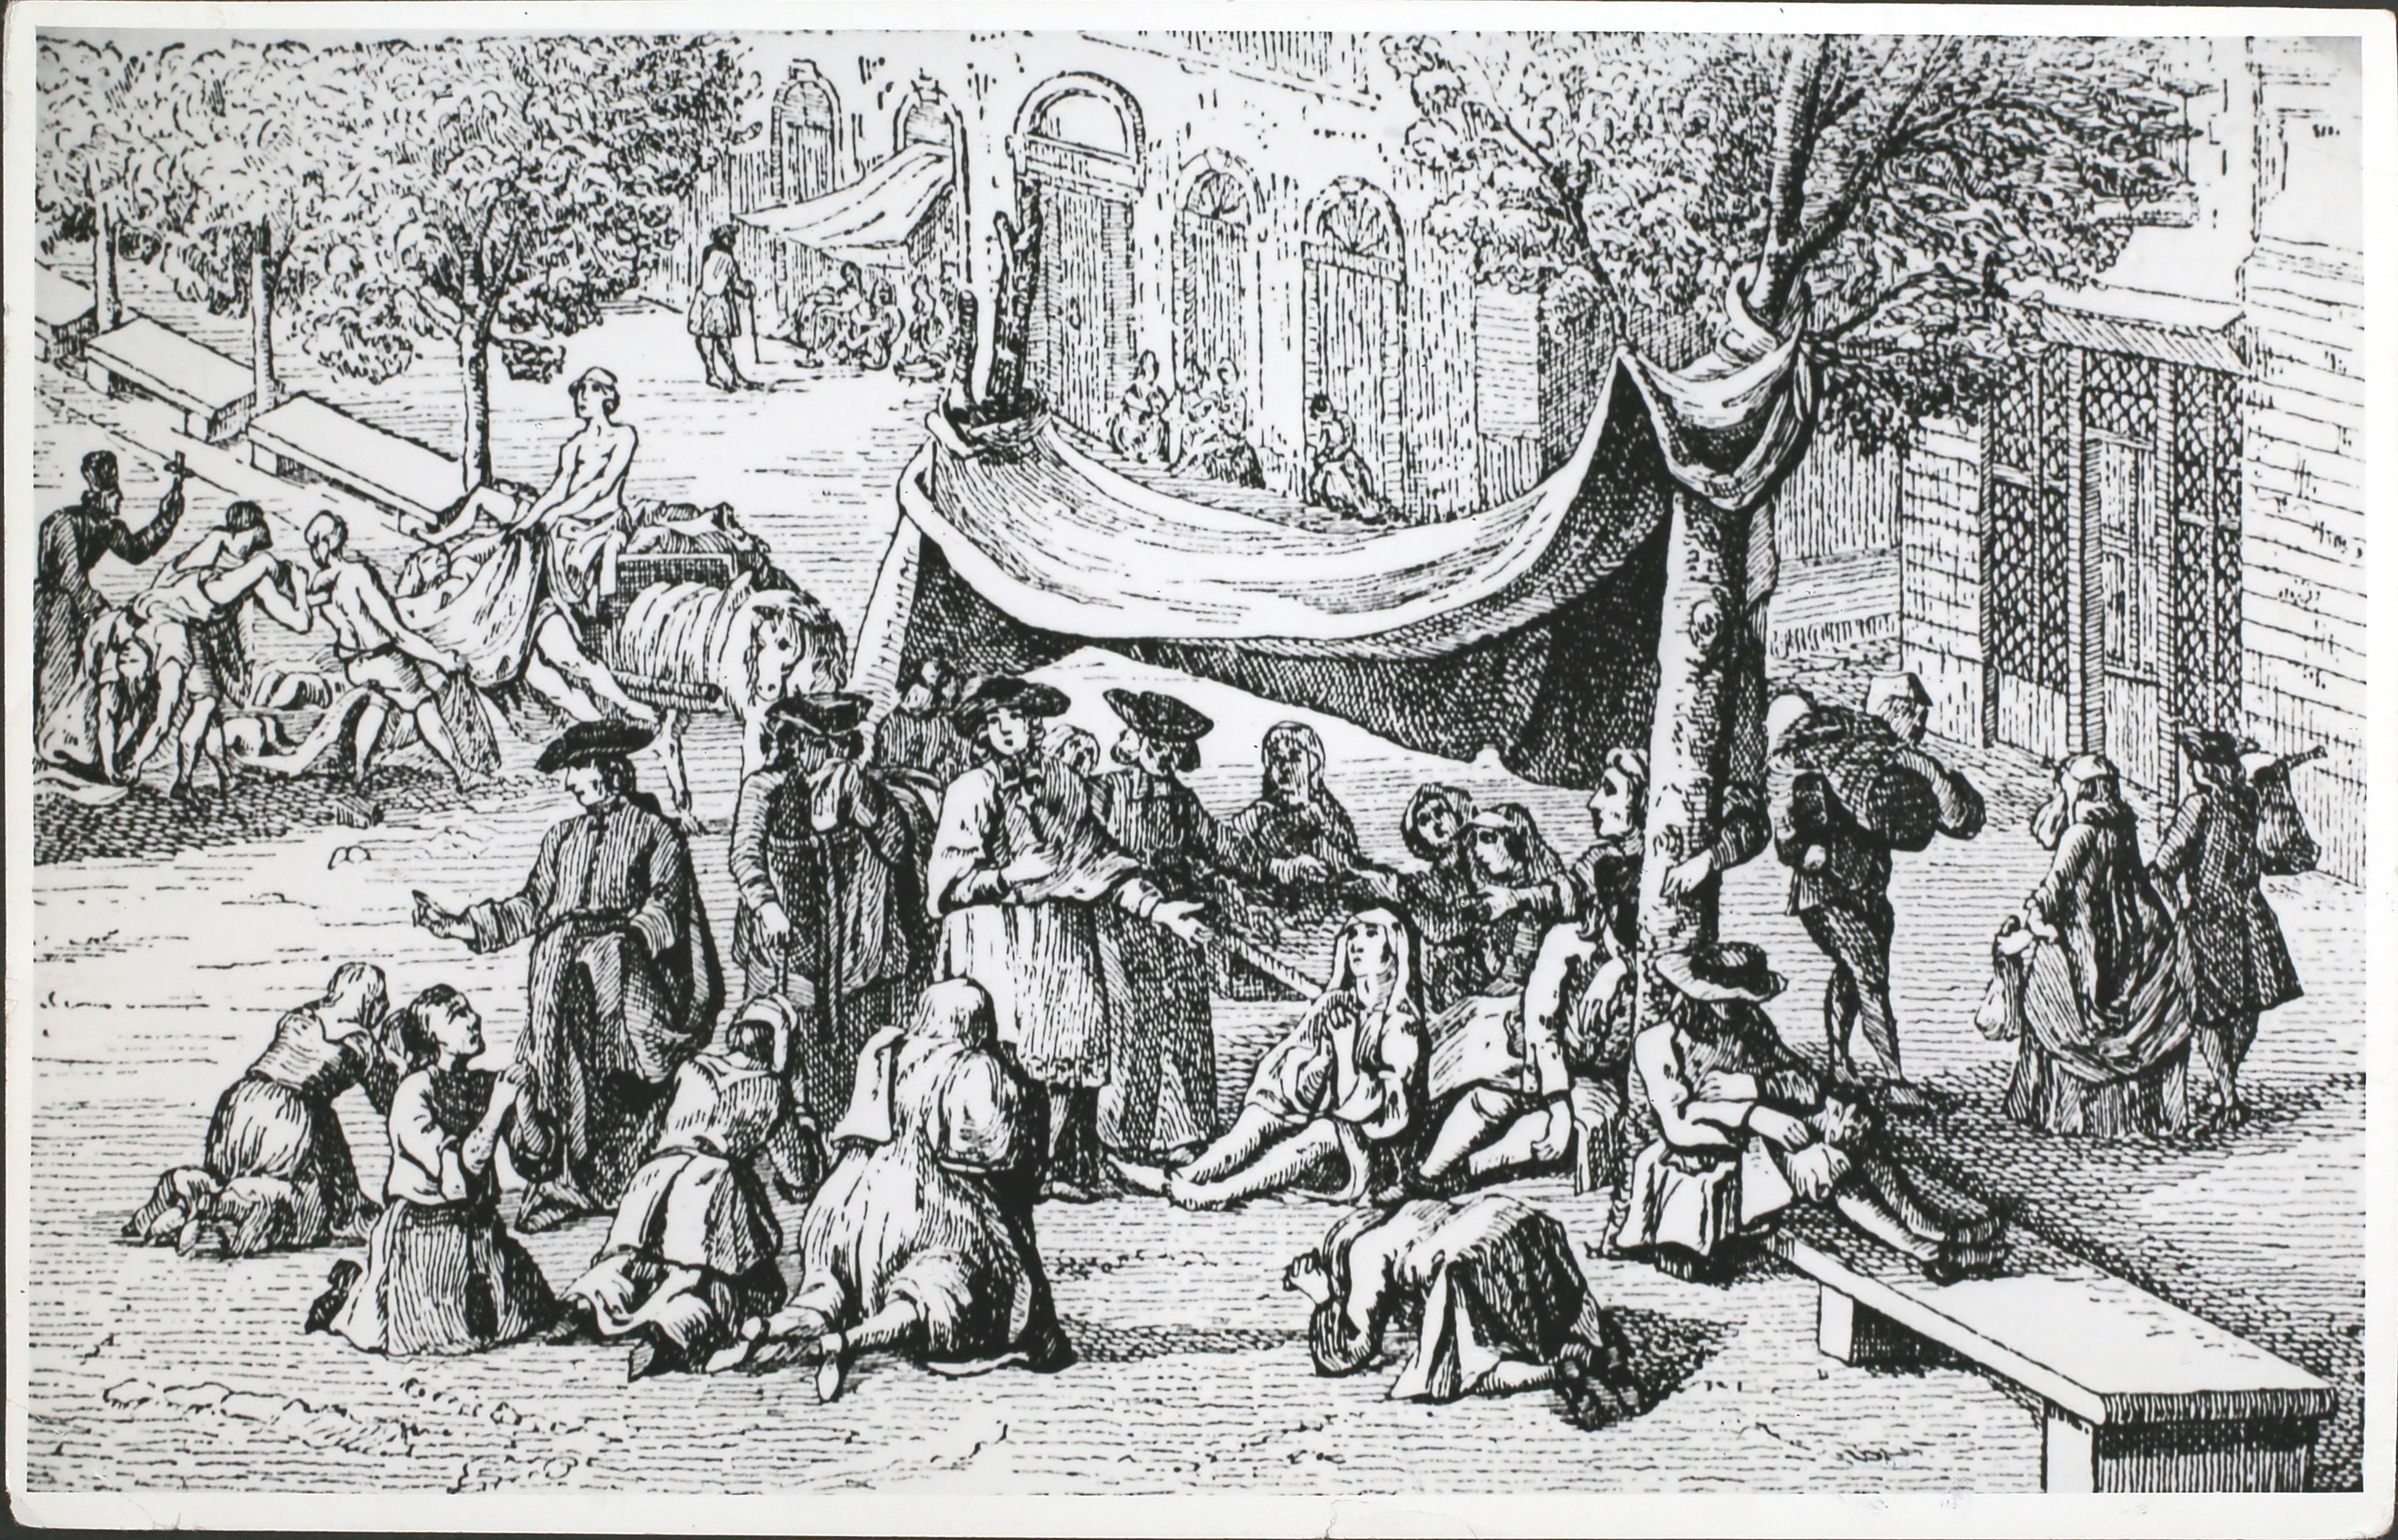 1720 Plague